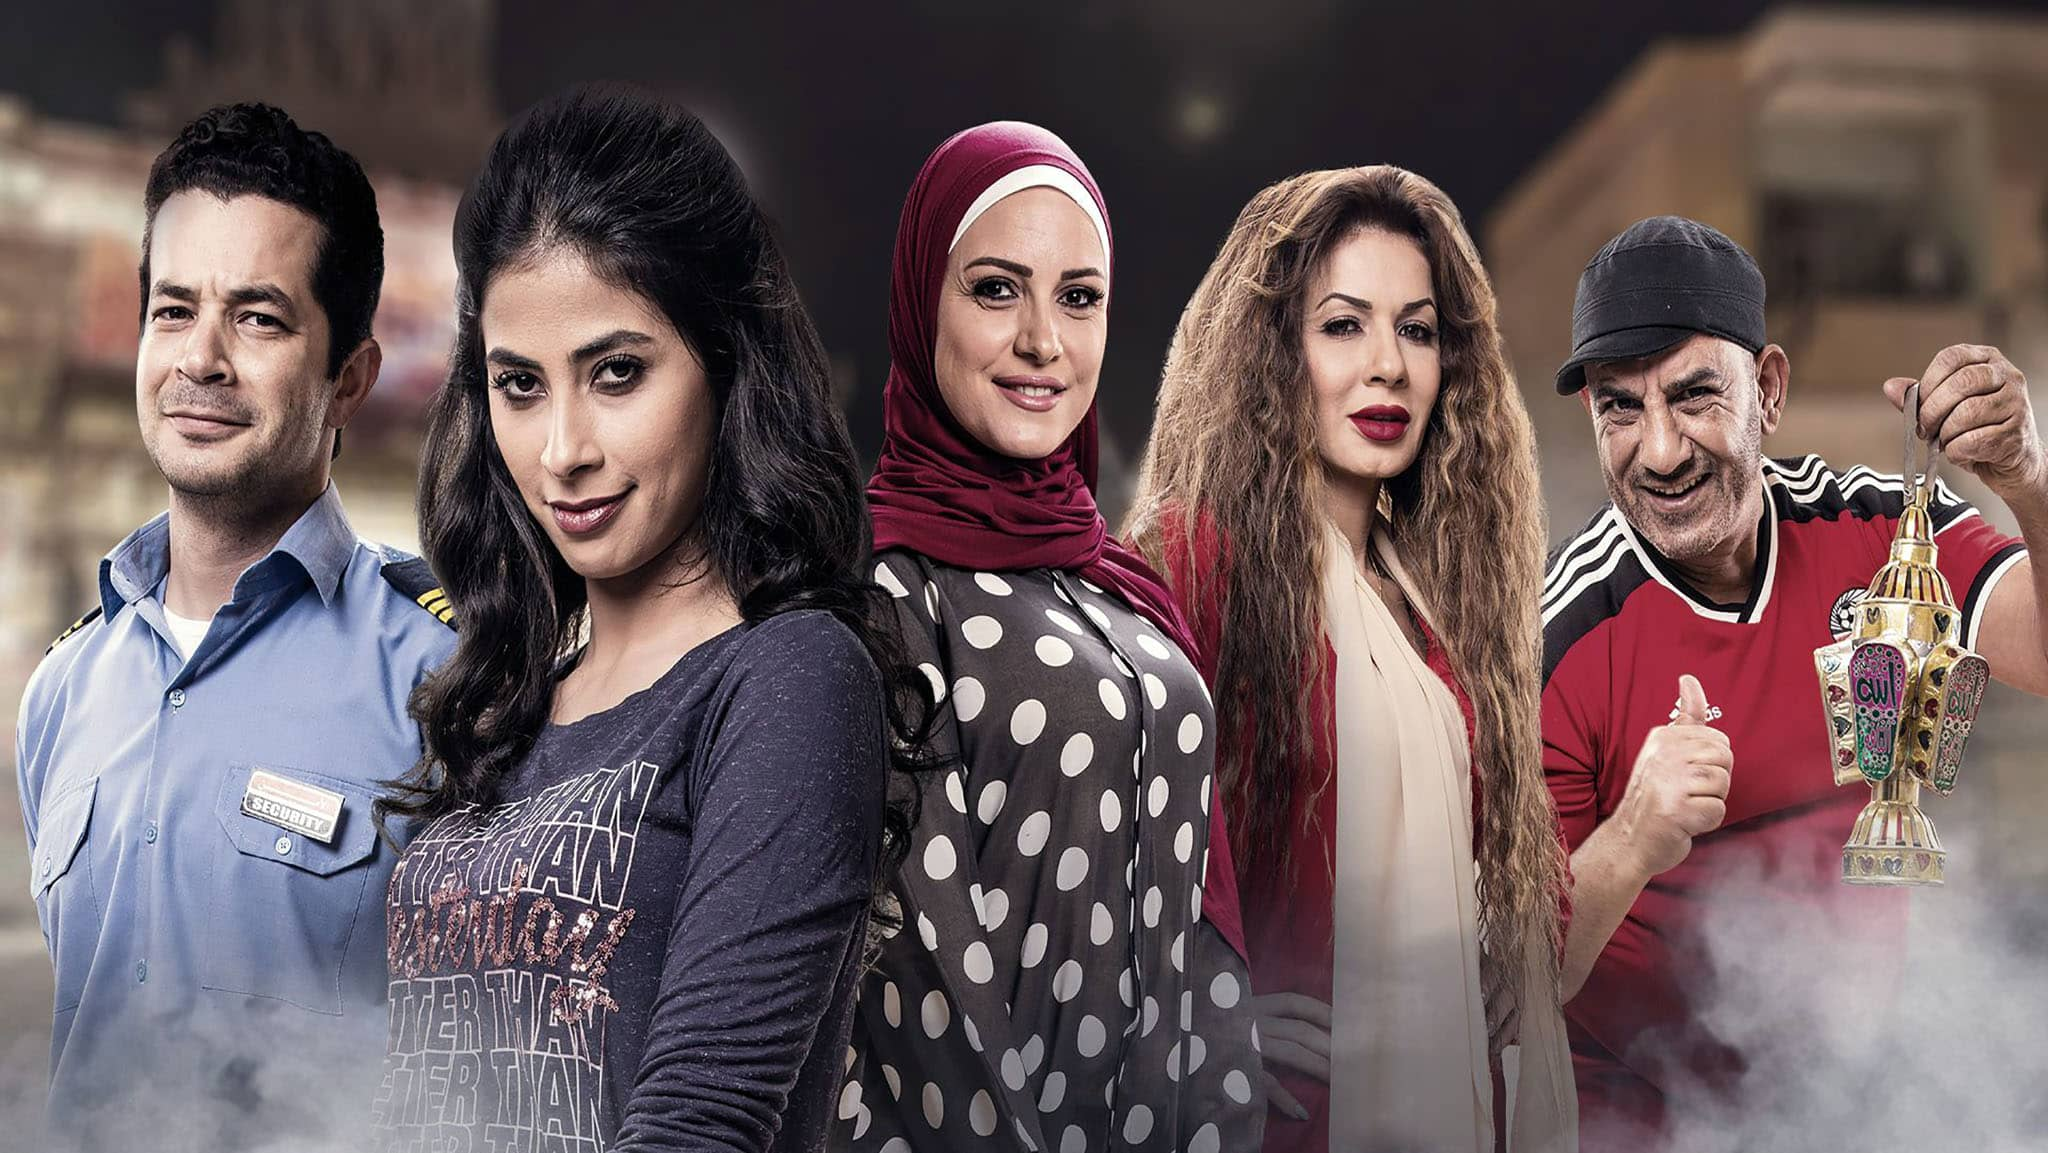 مسلسل رمضان كريم 2017